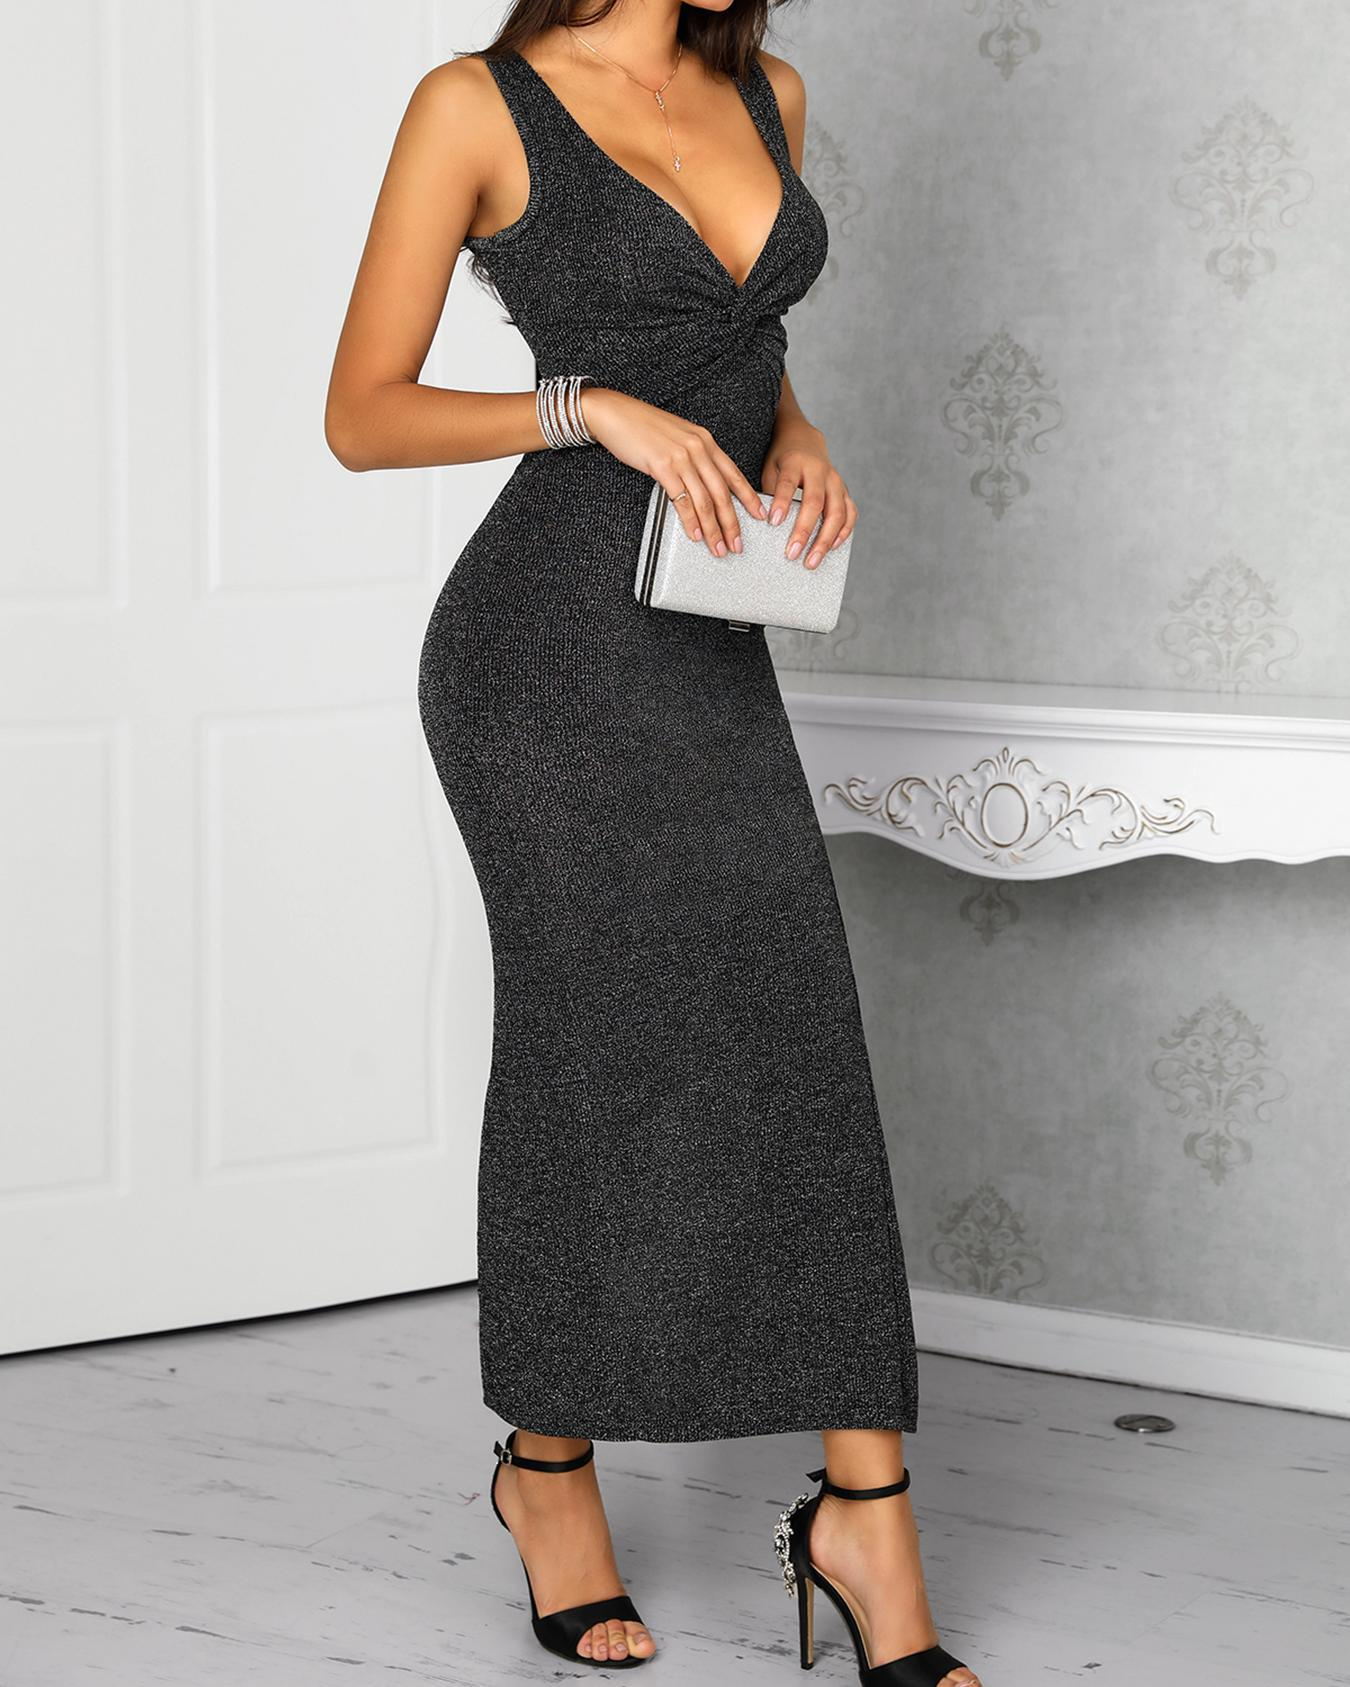 Deep V-Neck Ruched High Slit Evening Dress фото